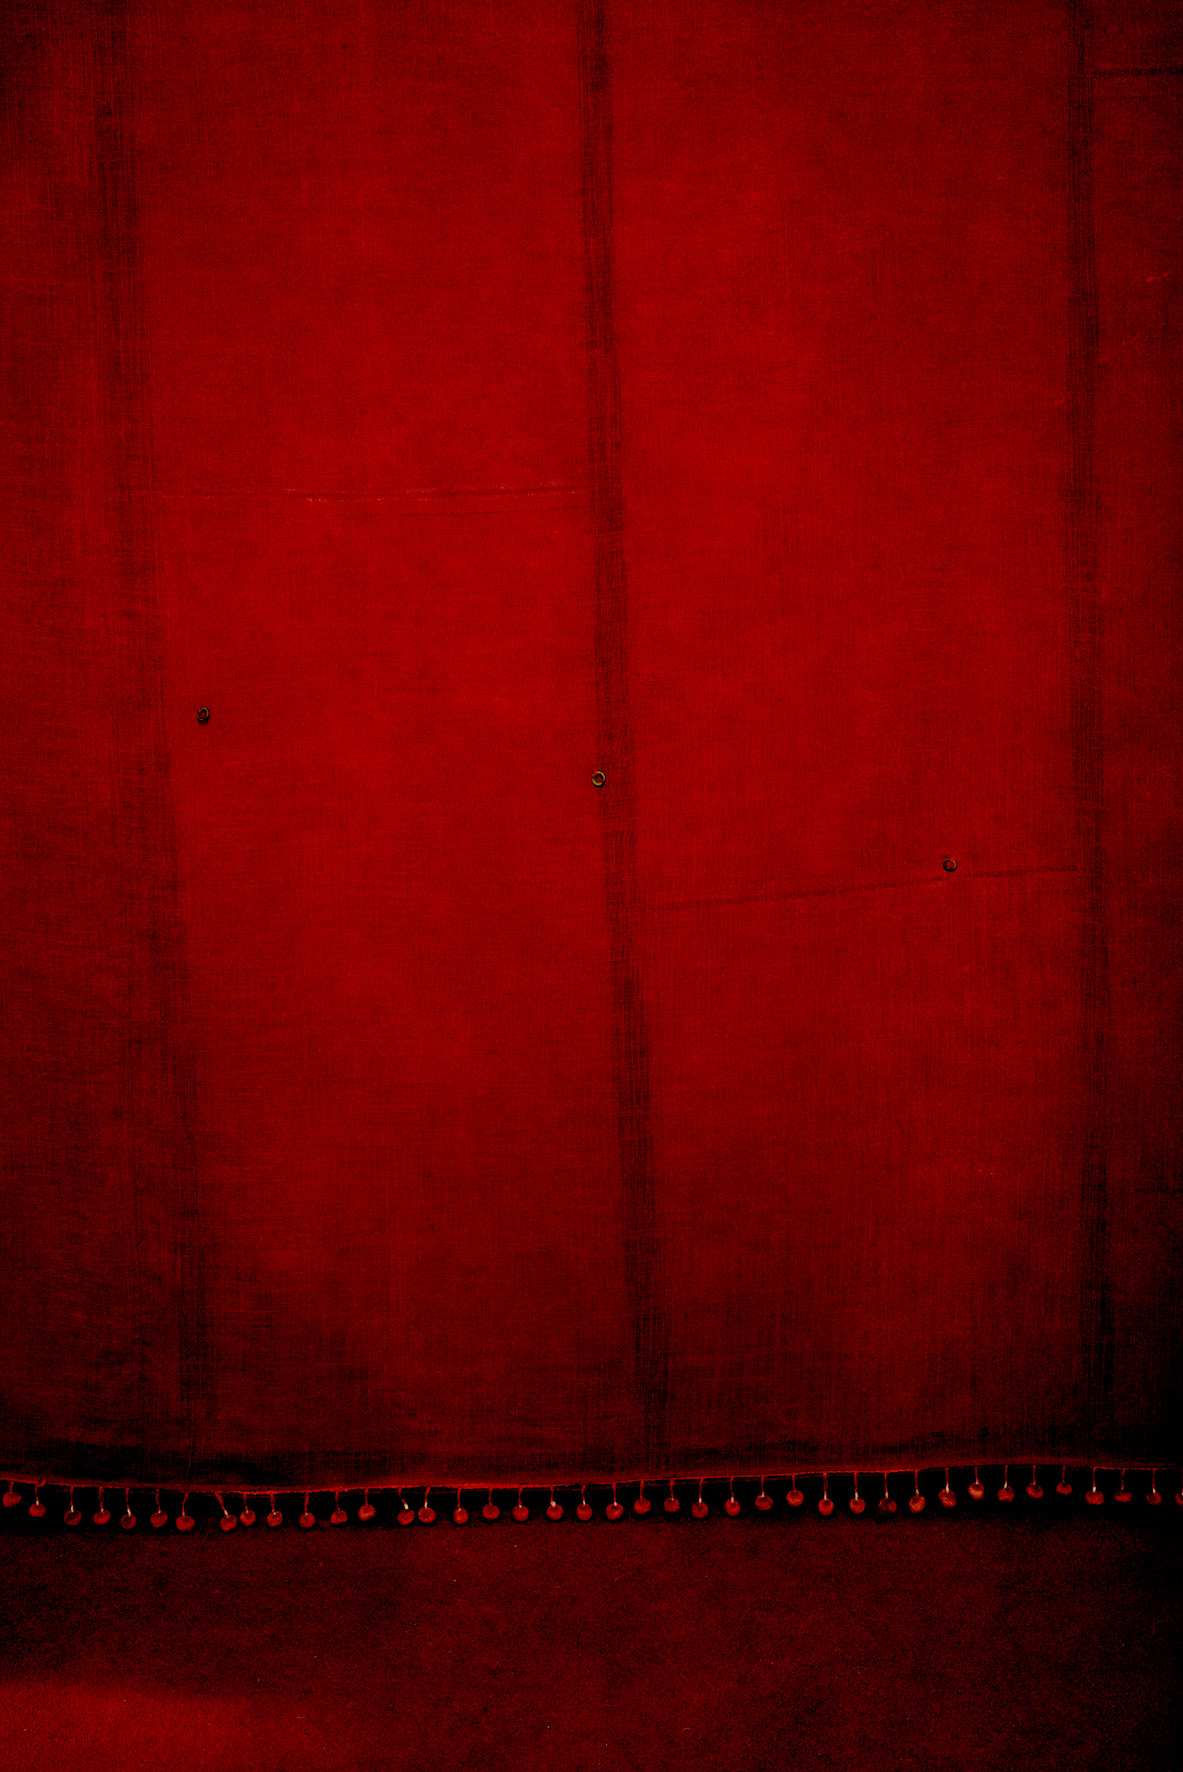 RedCurtain-step3.jpg